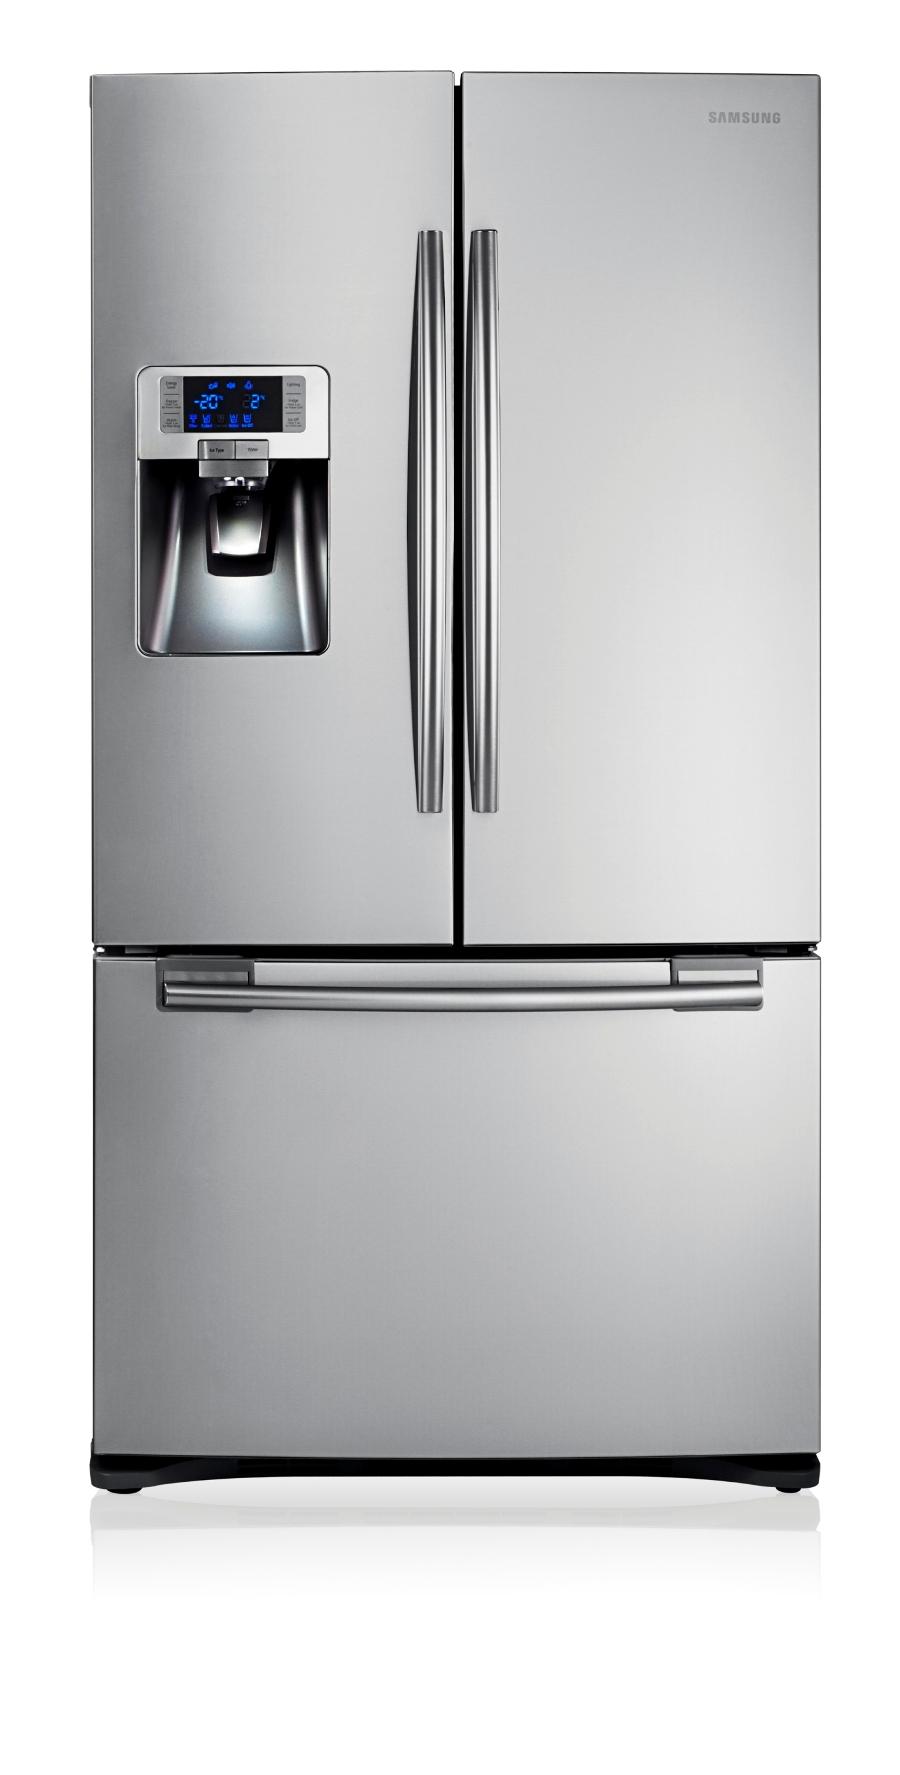 Space Max French Door Refrigerator_ok